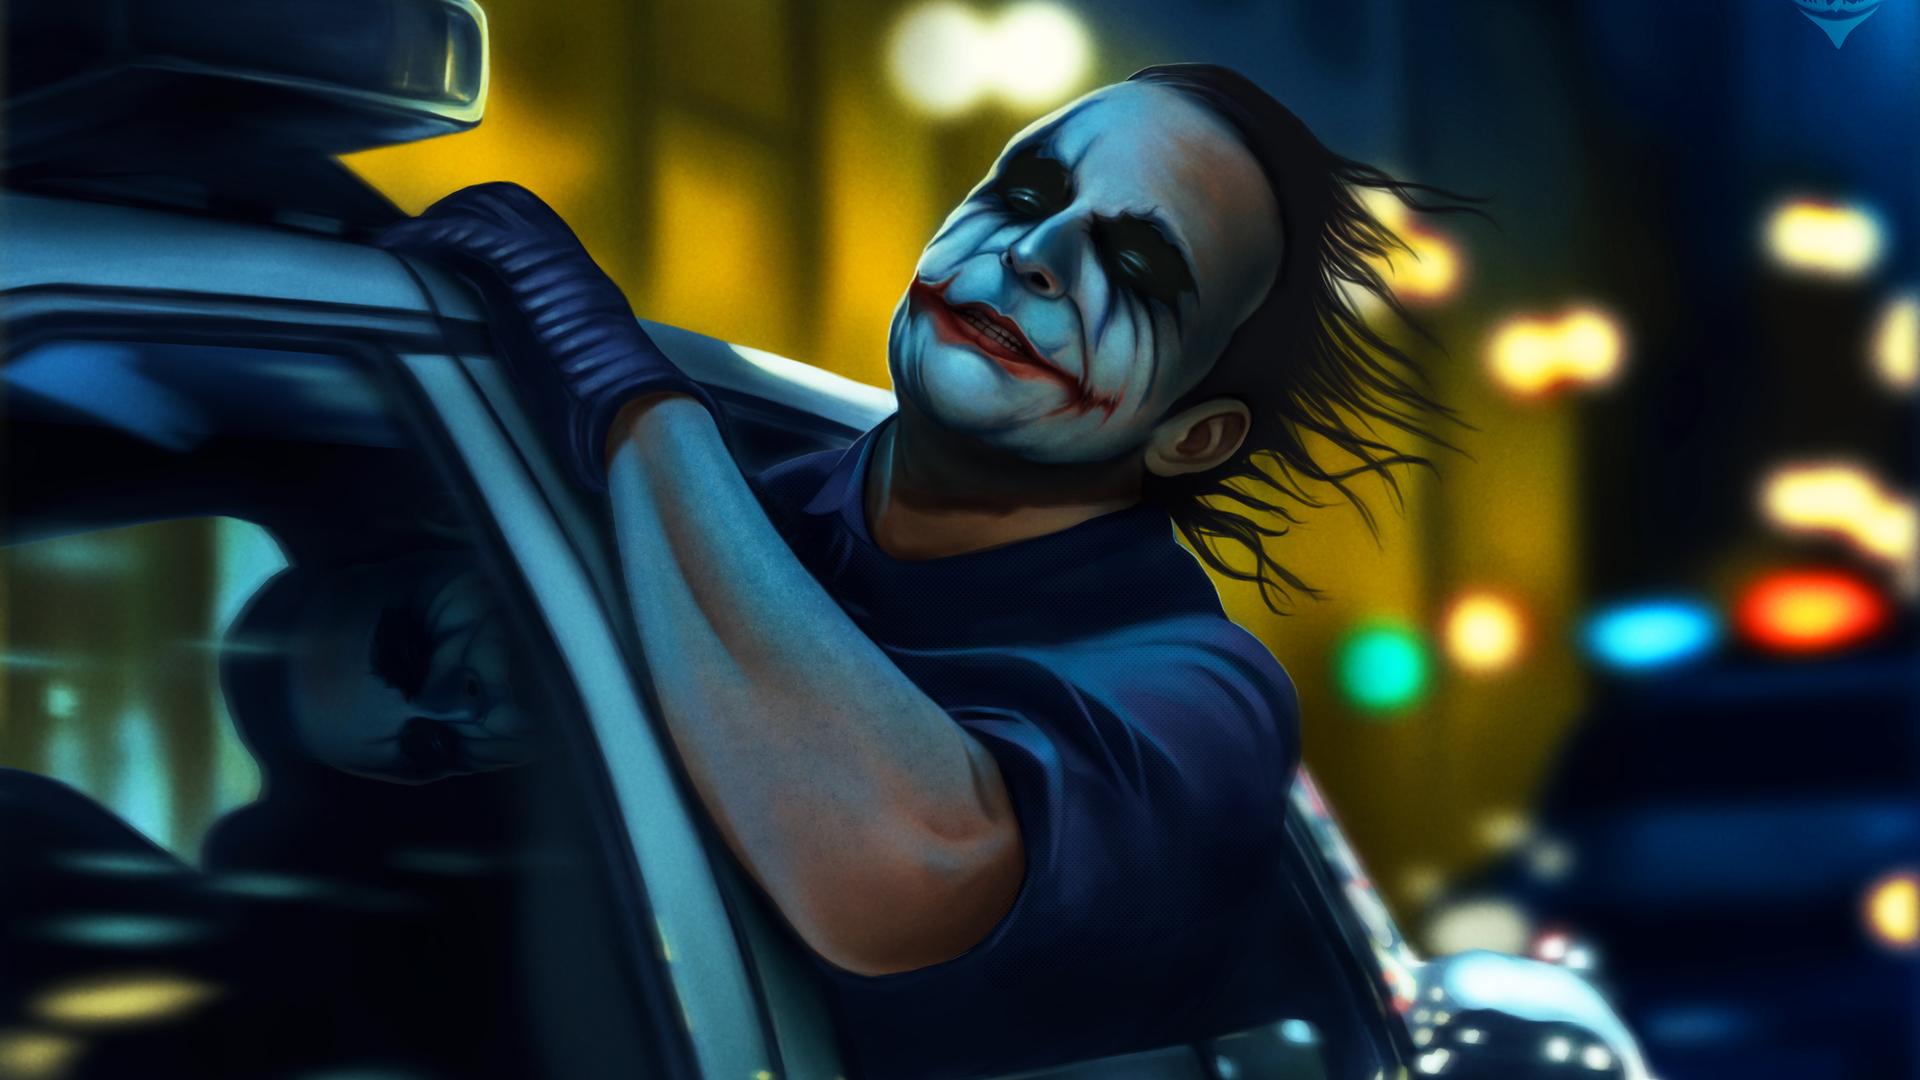 1920x1080 Joker The Dark Knight 4k 2018 Laptop Full Hd 1080p